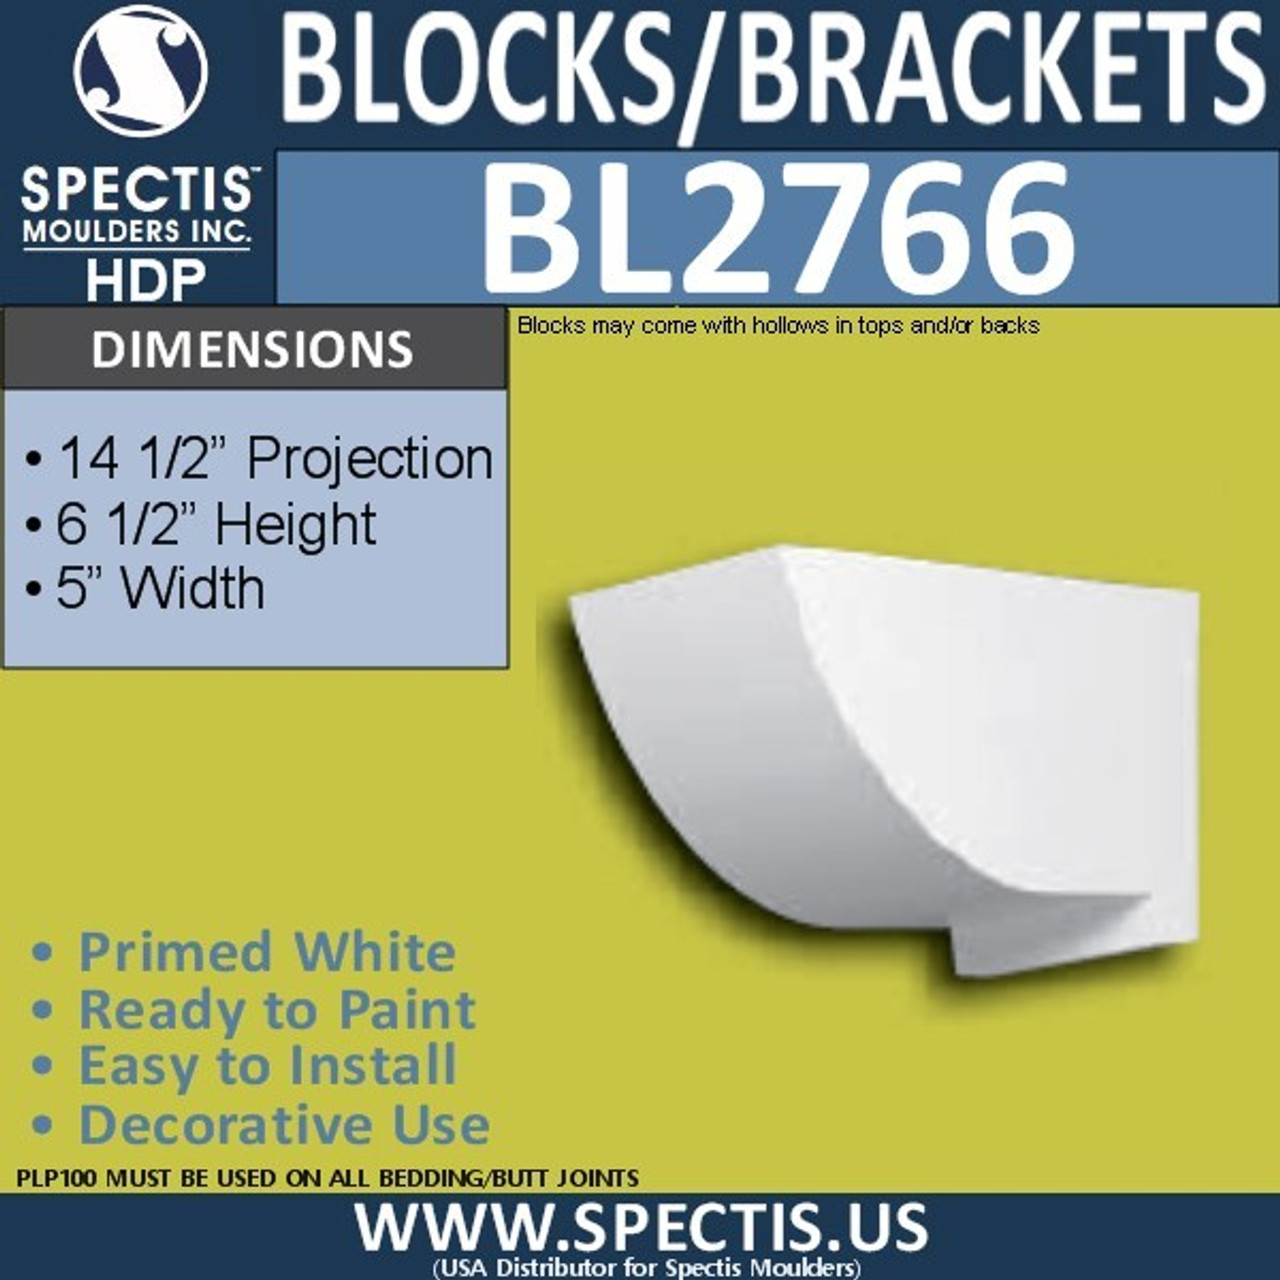 "BL2766 Eave Block or Bracket 5""W x 6.5""H x 14.5"" P"